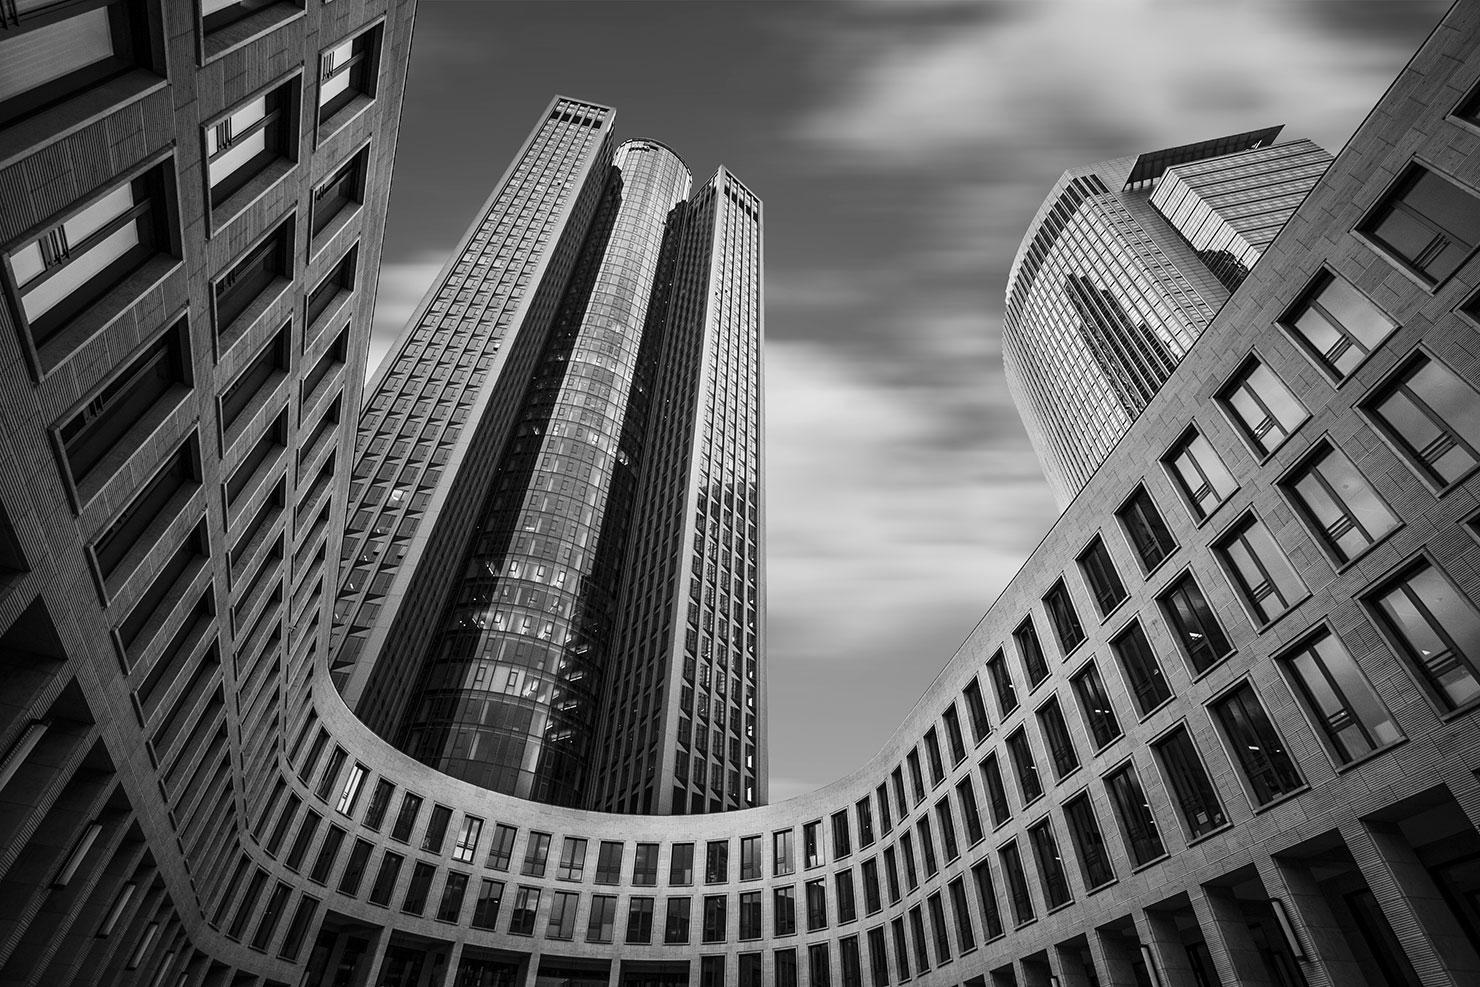 Frankfurt PWC-Tower 185